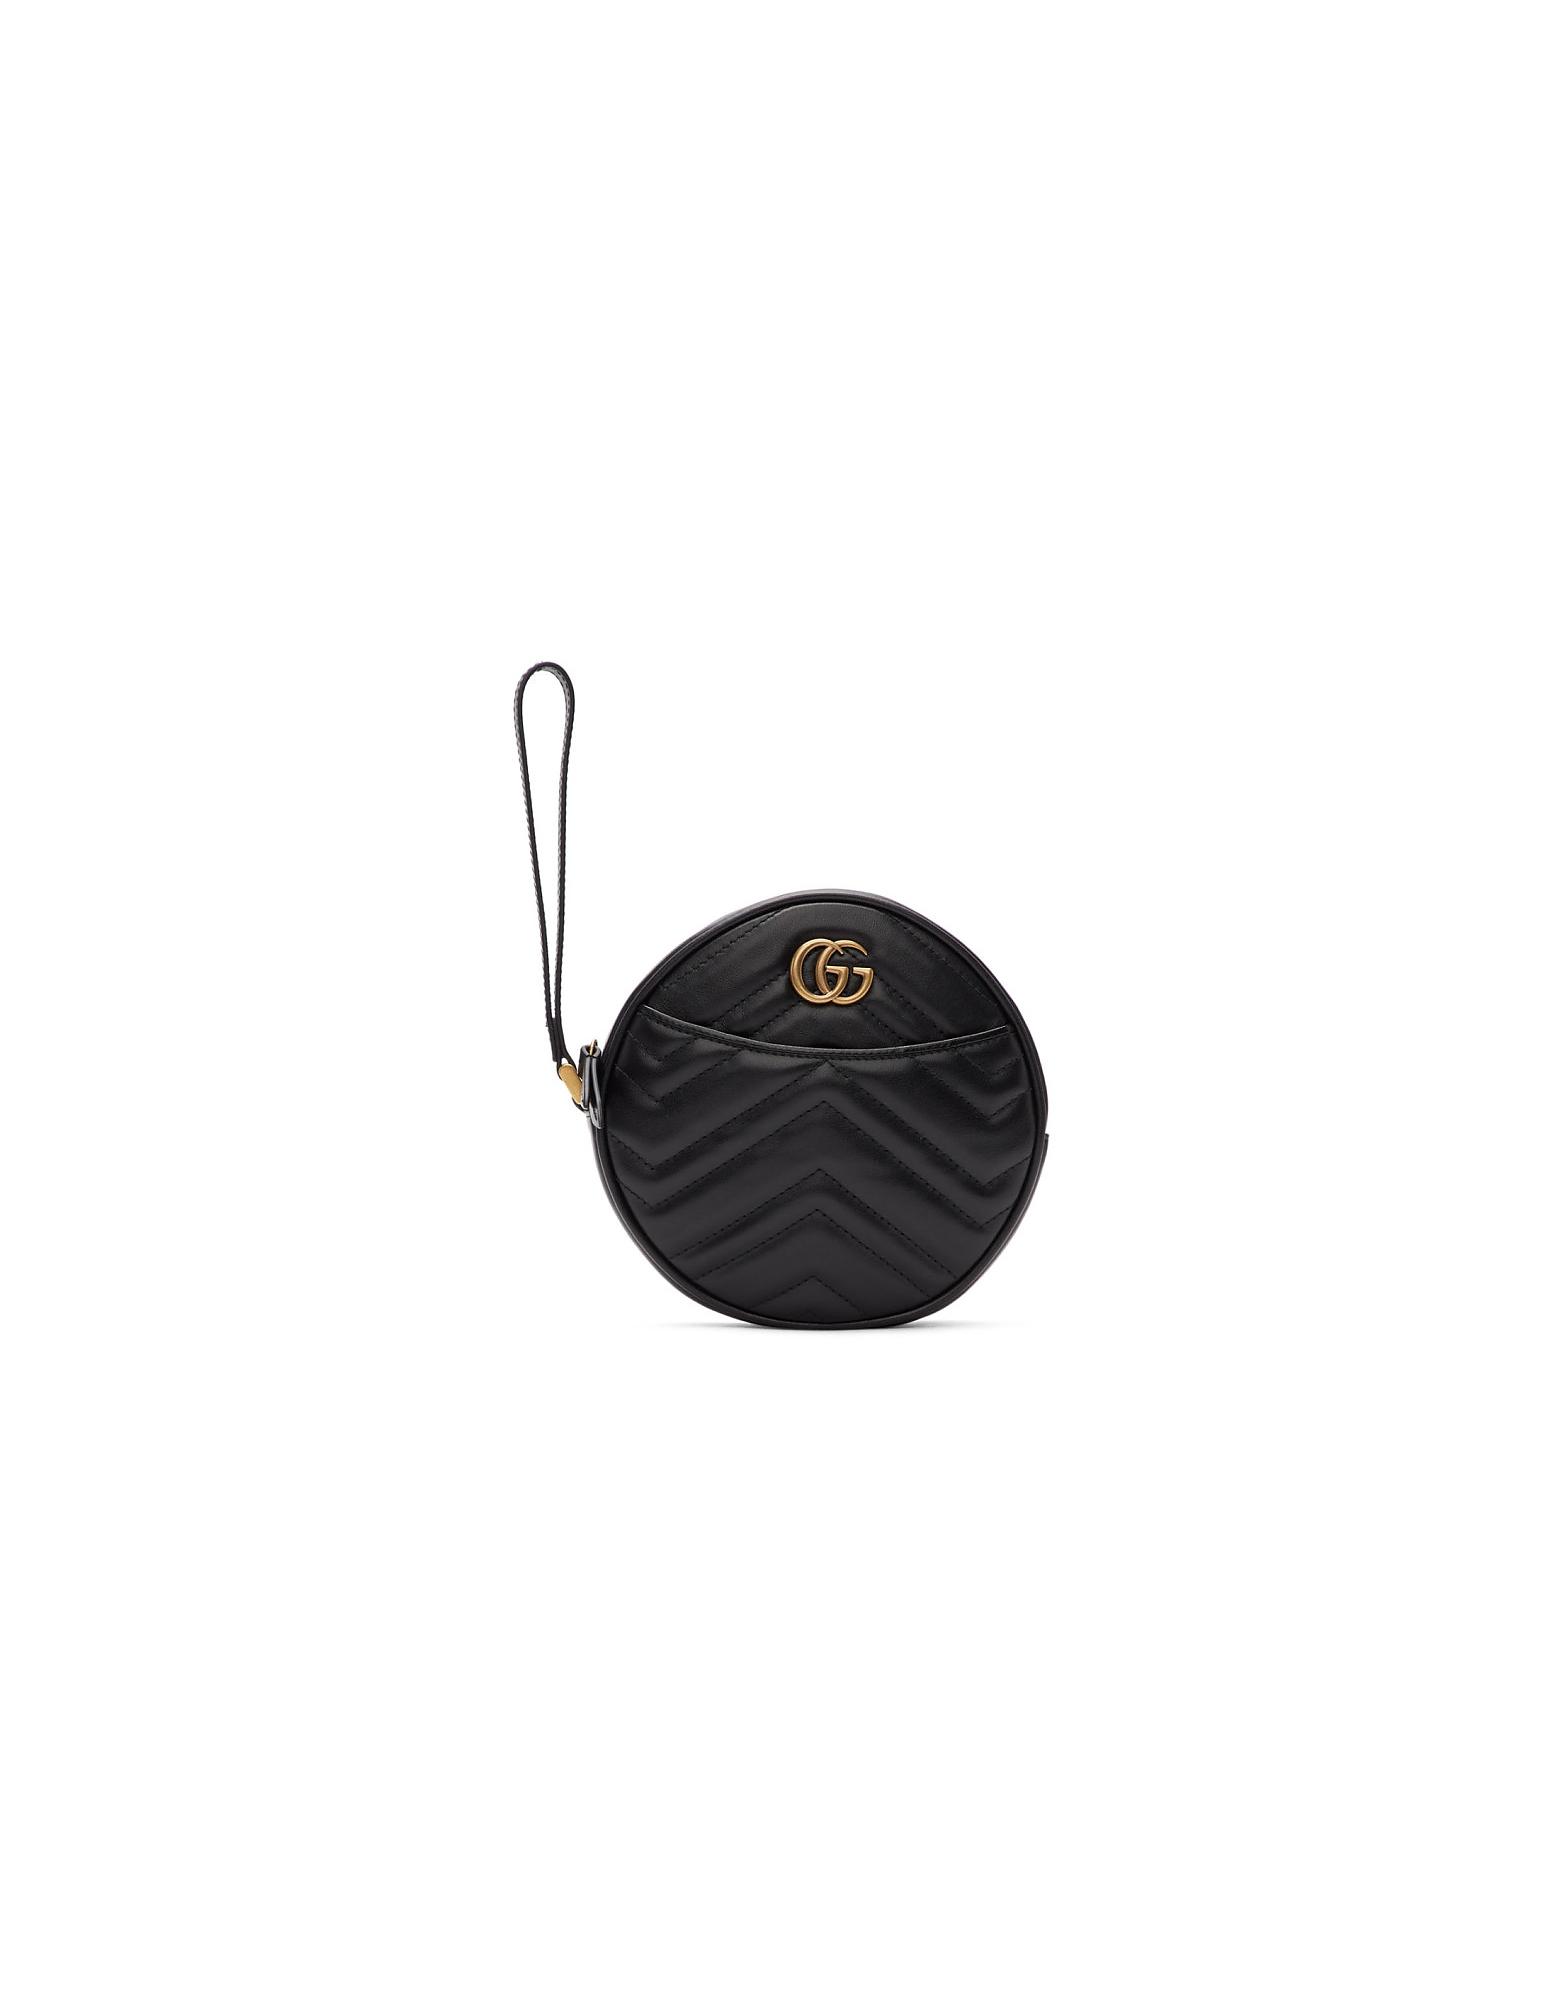 Gucci Designer Handbags, Black GG Marmont 2.0 Clutch